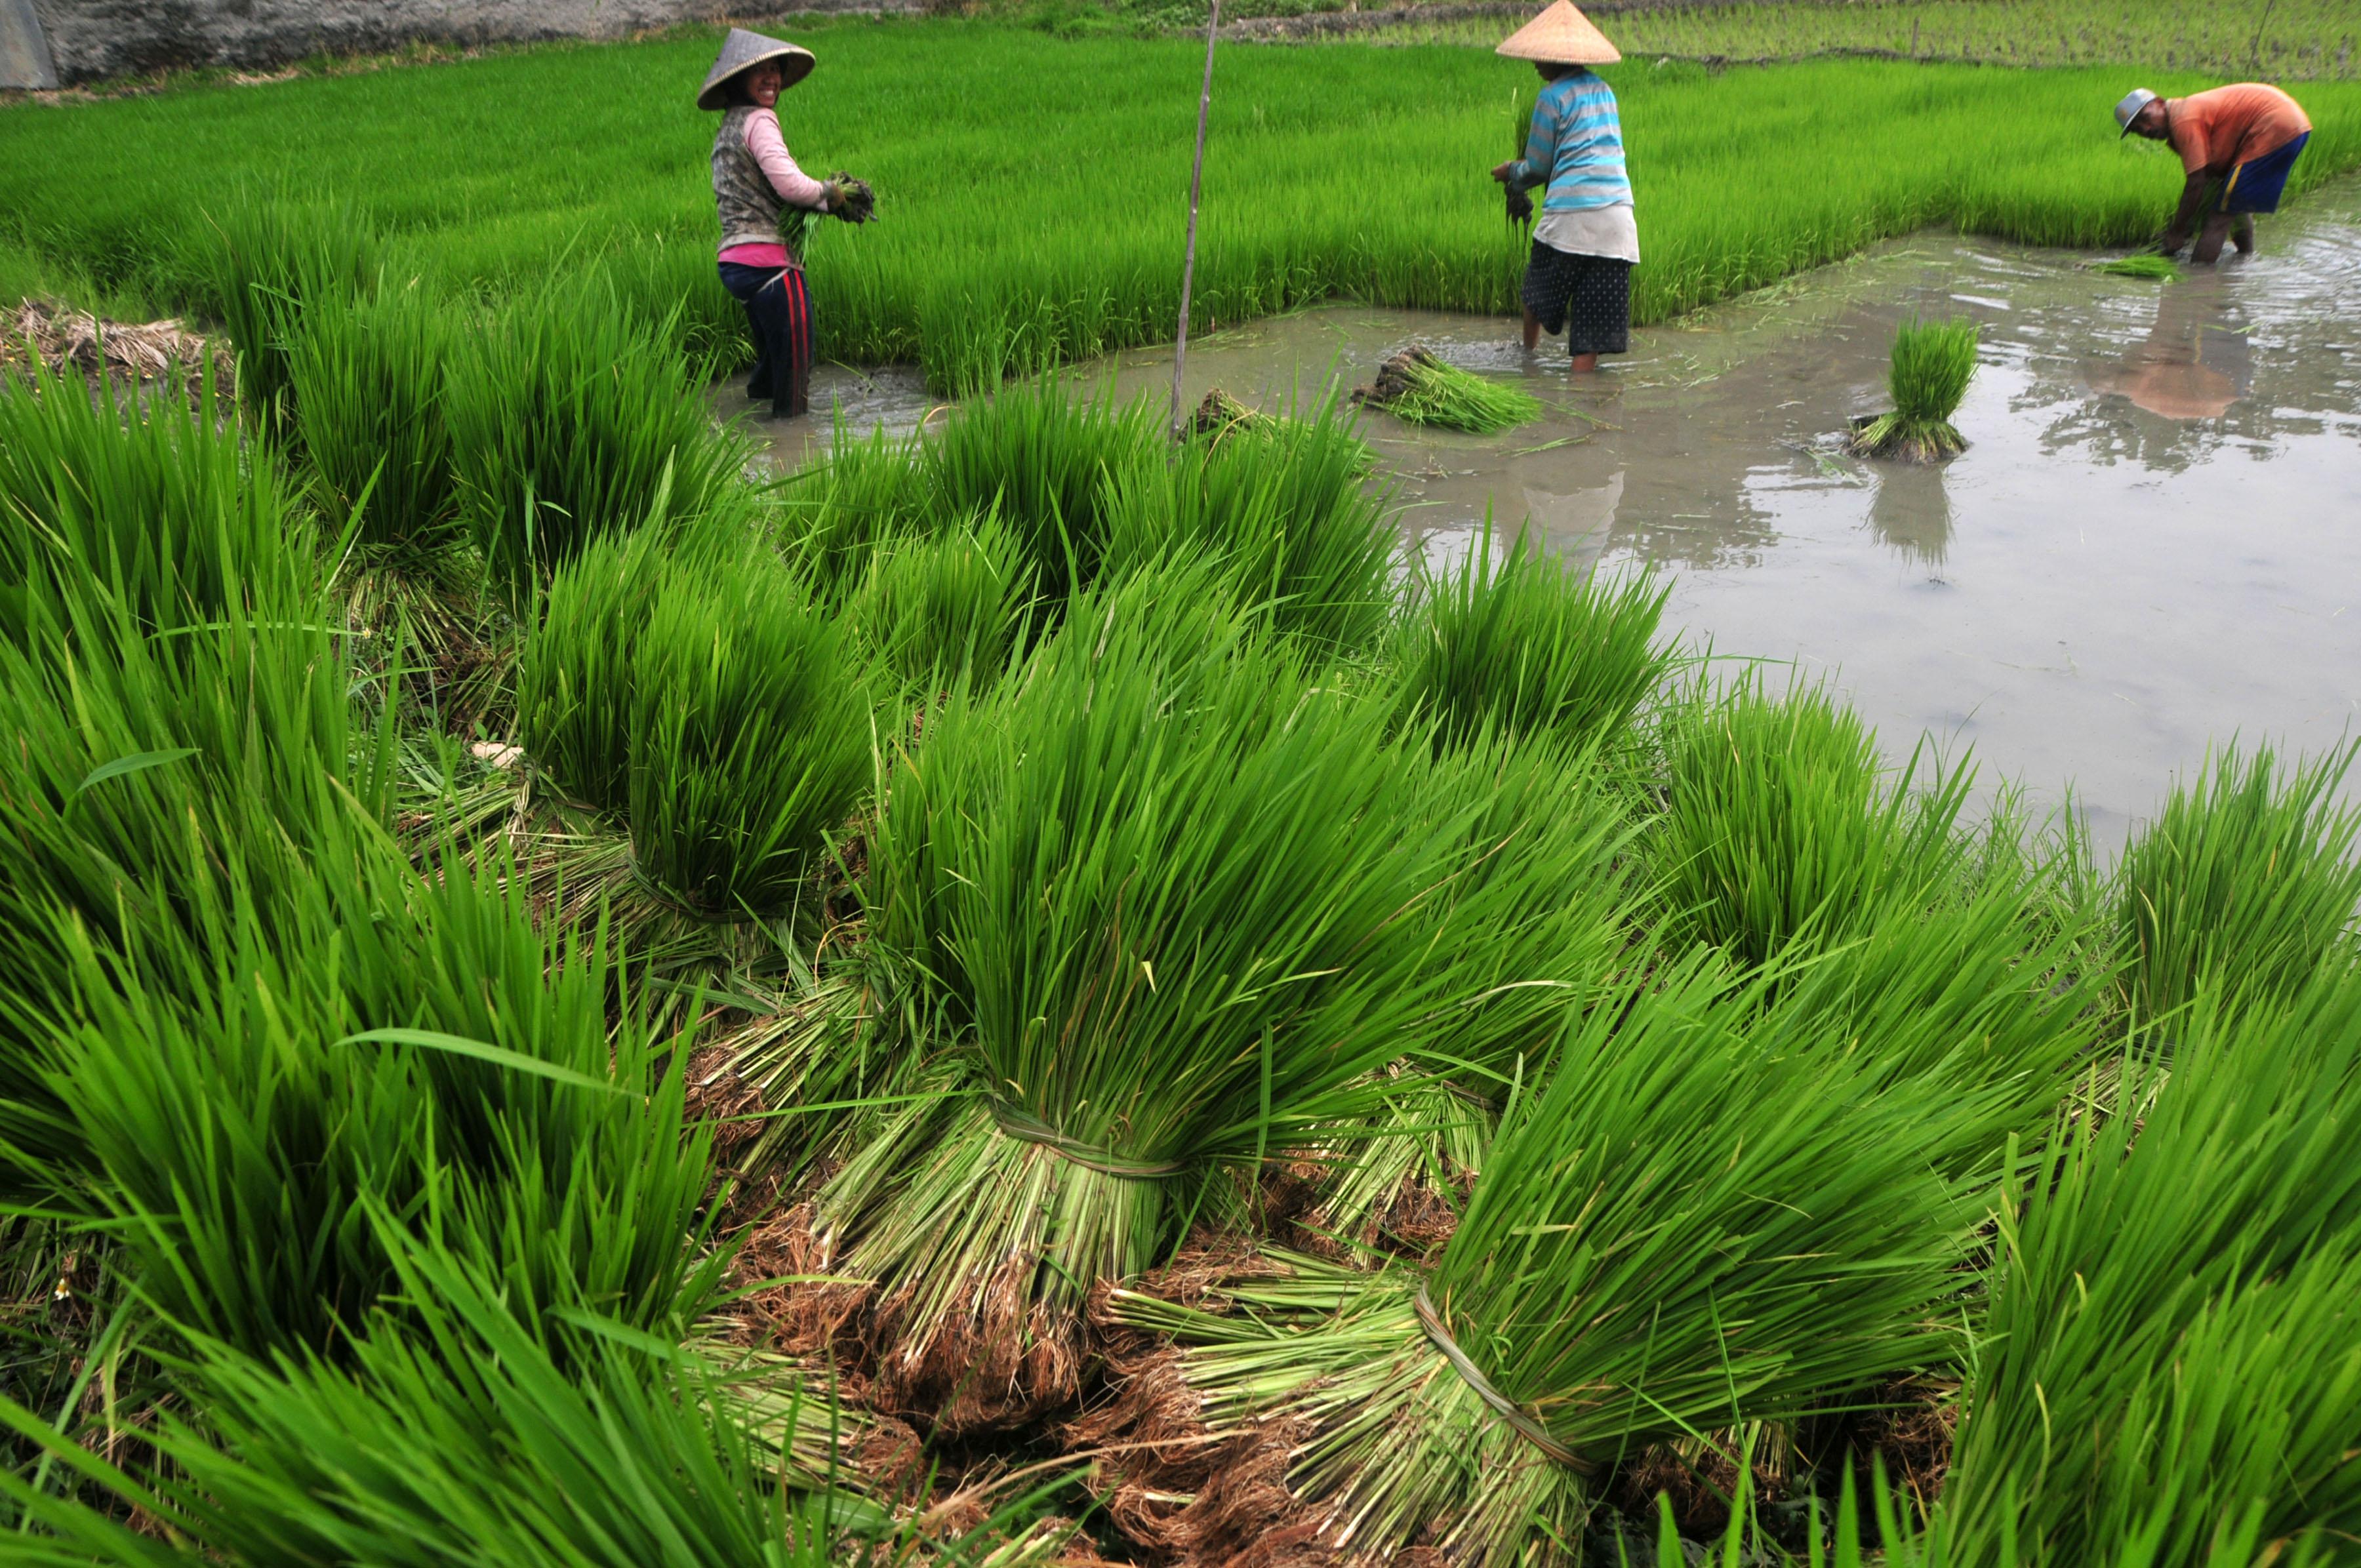 Sejumlah pekerja memindahkan bibit tanaman padi yang siap ditanam di Desa Pesarean, Kabupaten Tegal, Jateng, Senin (8/12). Kementerian Pertanian menyalurkan bantuan berupa benih, pupuk dan alat mesin pertanian guna mengoptimalkan pemanfaatan 500 ribu hektare lahan pertanian di 12 provinsi dengan anggaran Rp1,3 triliun pada musim tanam pertama. ANTARA FOTO/Oky Lukmansyah/Koz/mes/14.